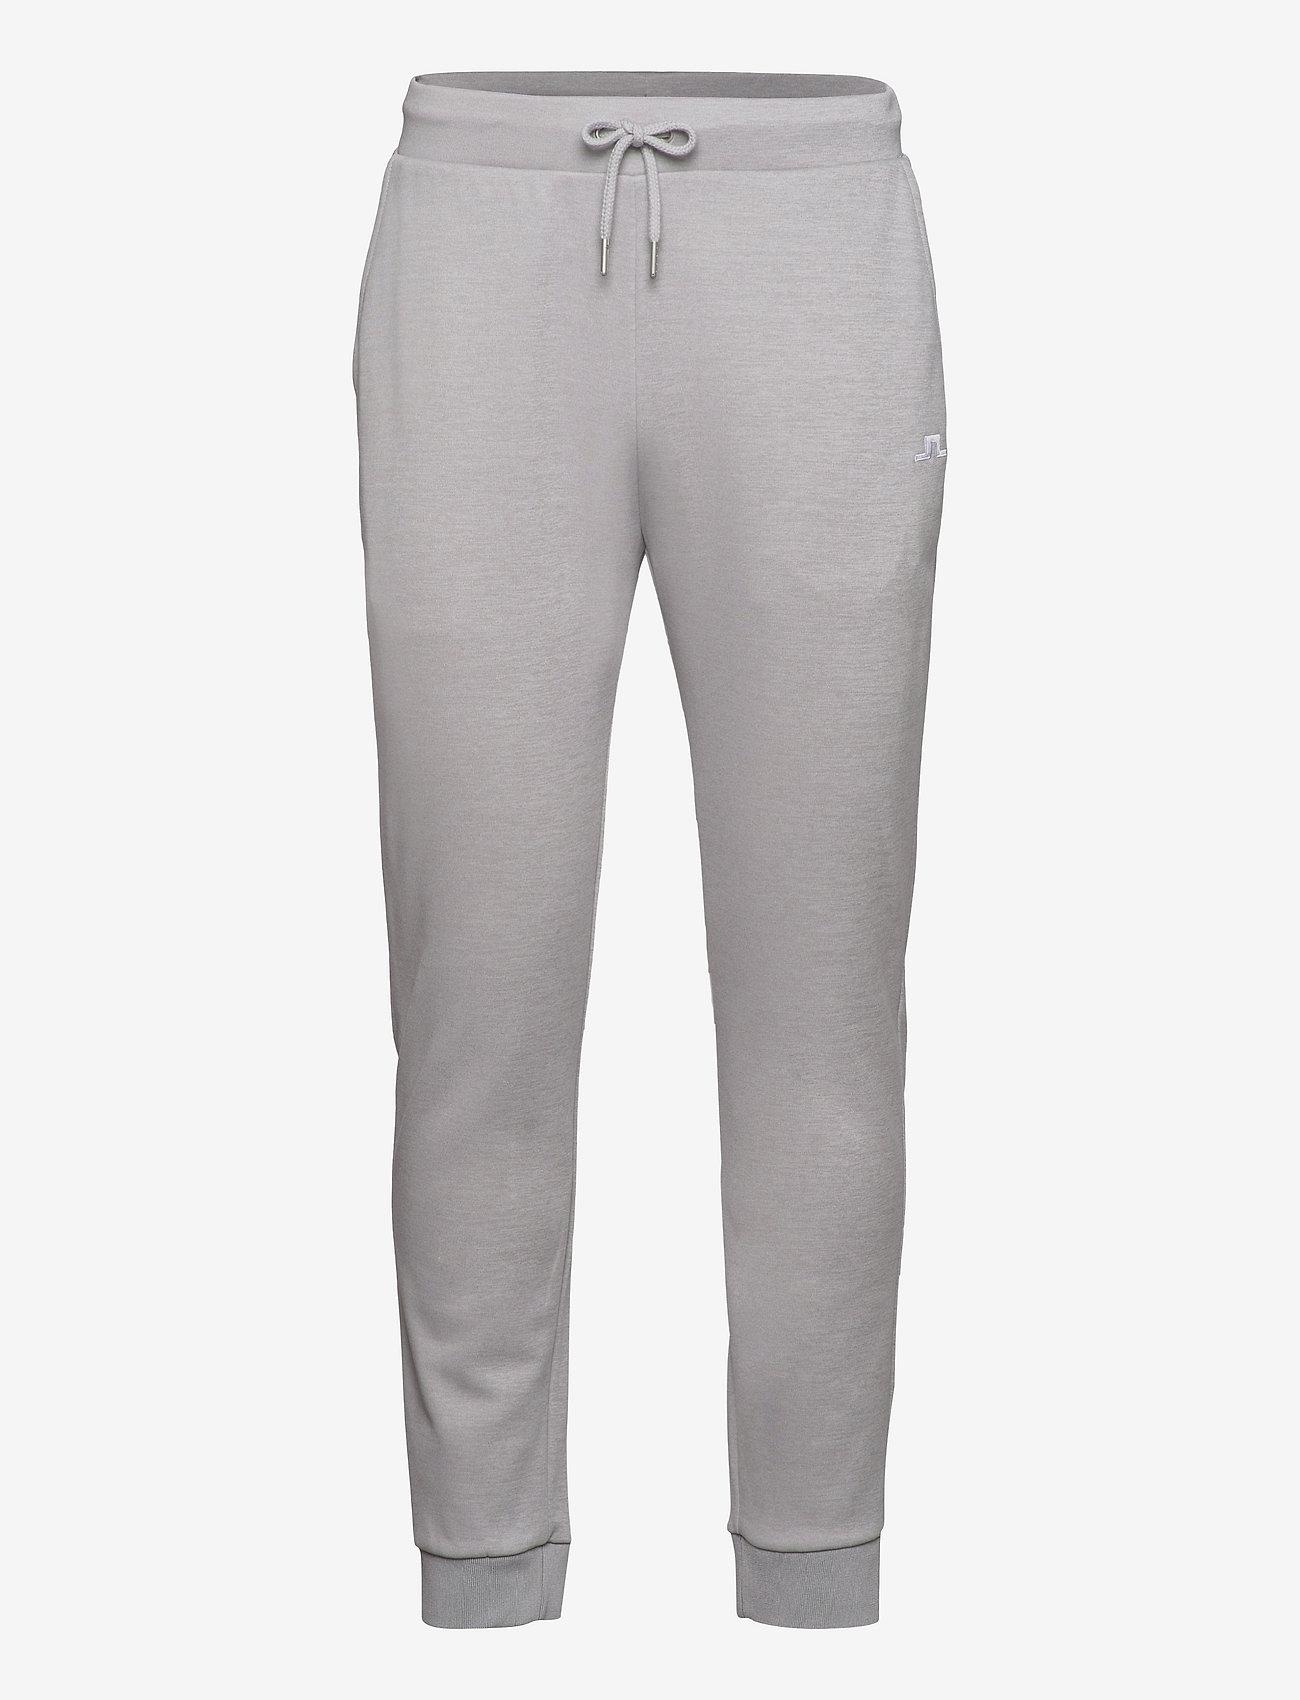 J. Lindeberg Golf - Stretch Fleece Light Pant - golfbukser - stone grey melange - 0